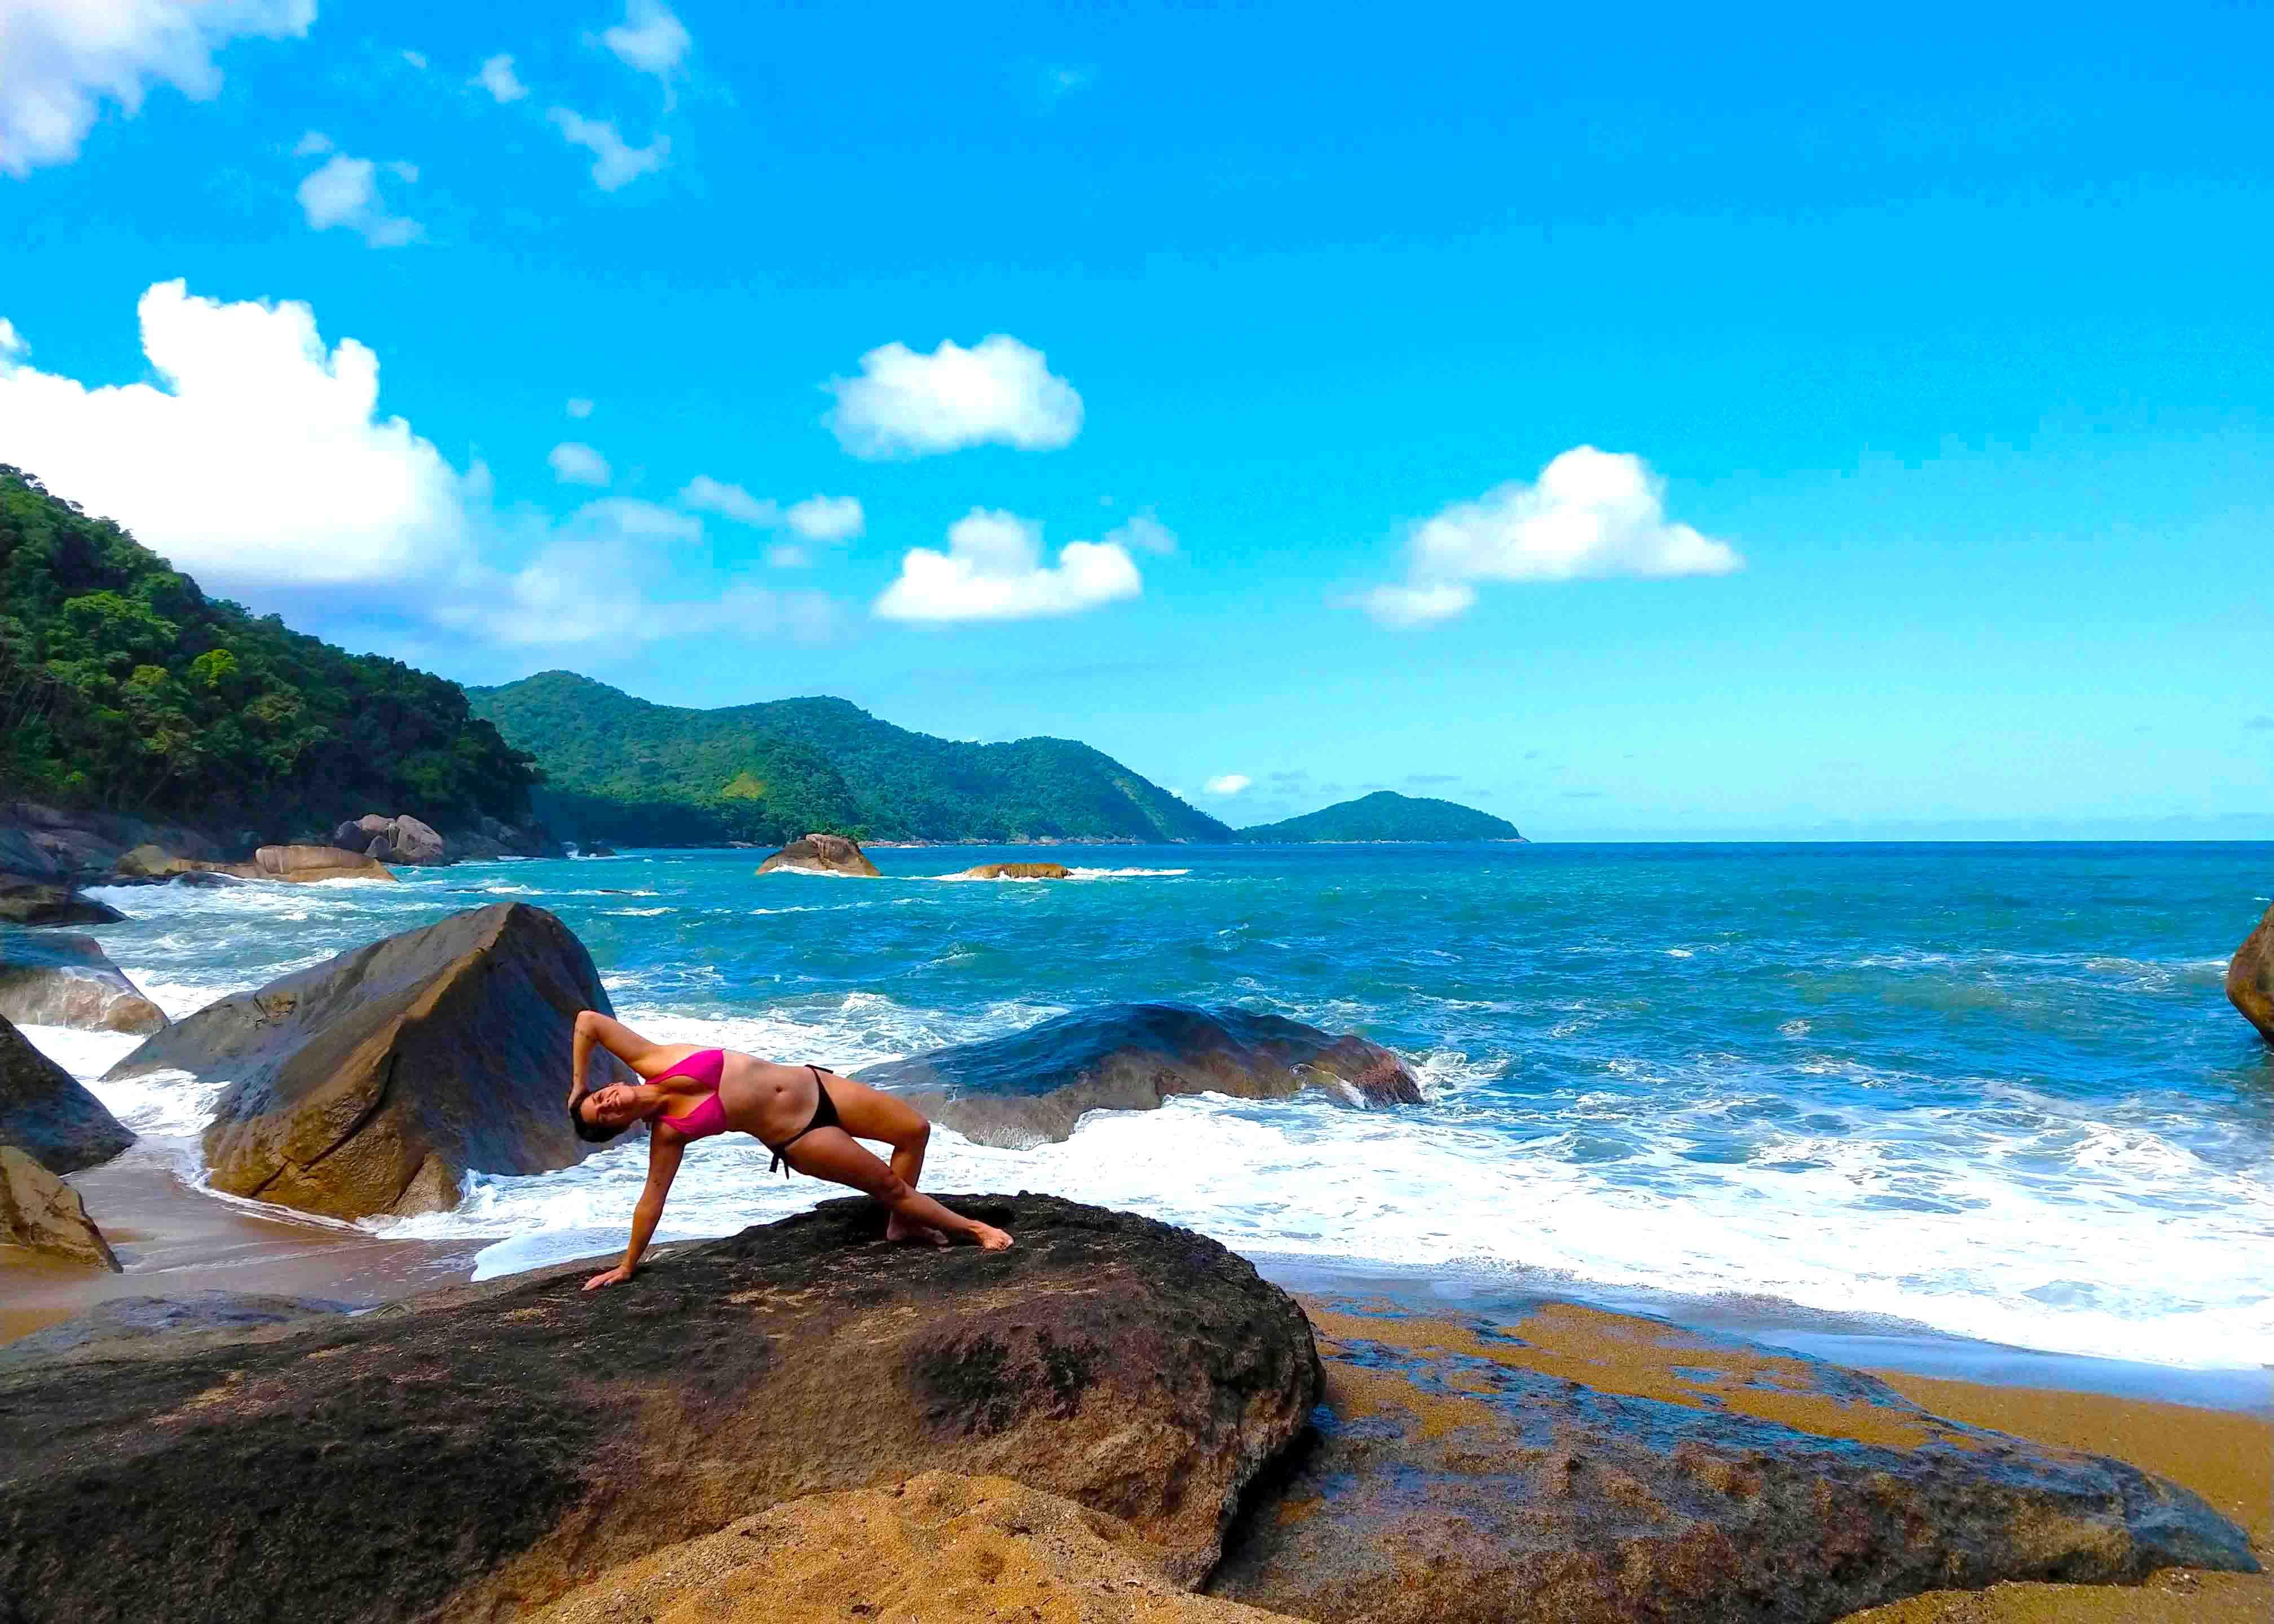 Ilhabela, Praia do Gato, Ecoturismo, Praia dos Castelhanos